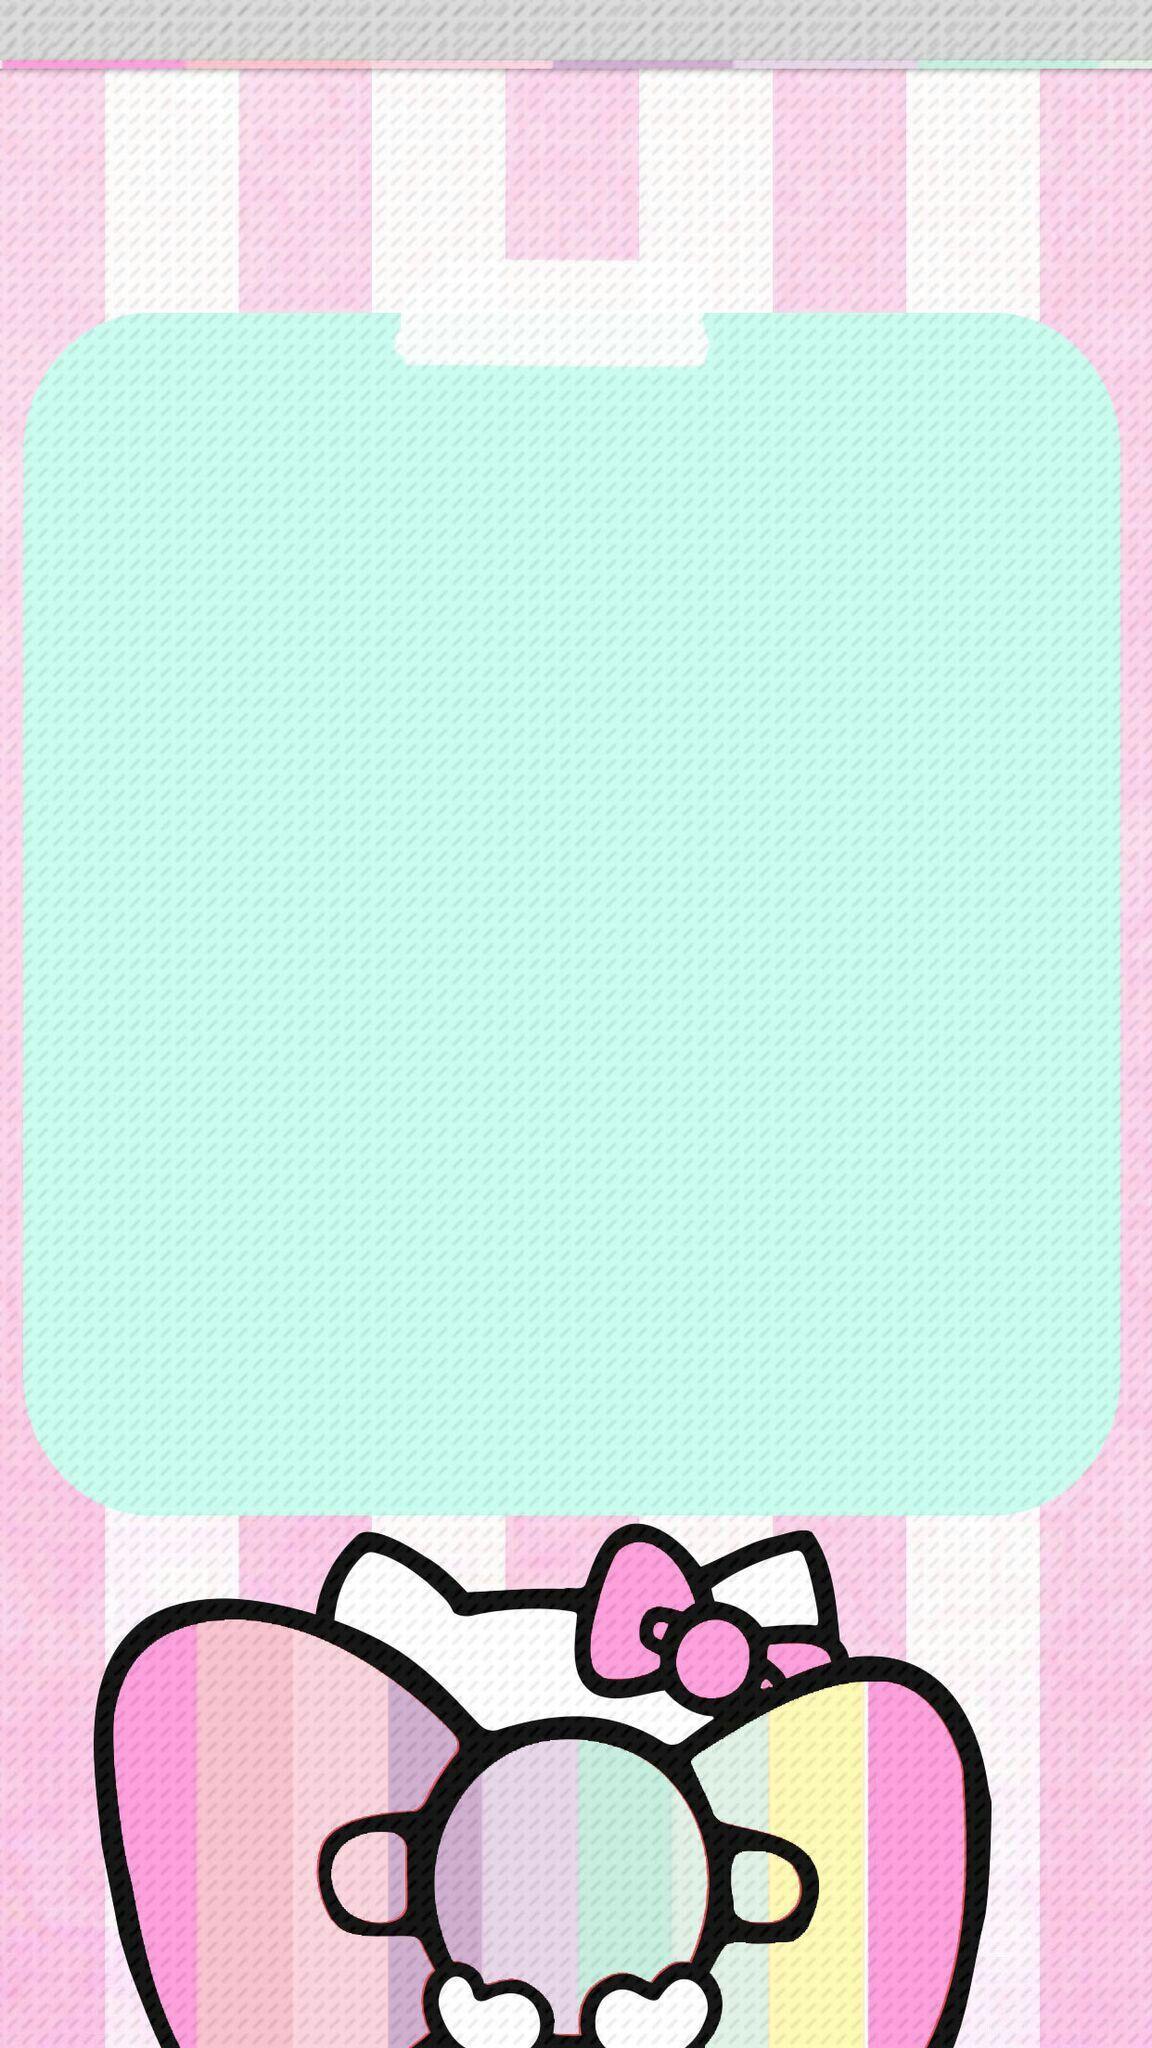 Great Wallpaper Hello Kitty Purple - 41b5b83c8cca002c61ca58f099b5dda0  Collection_125019.jpg